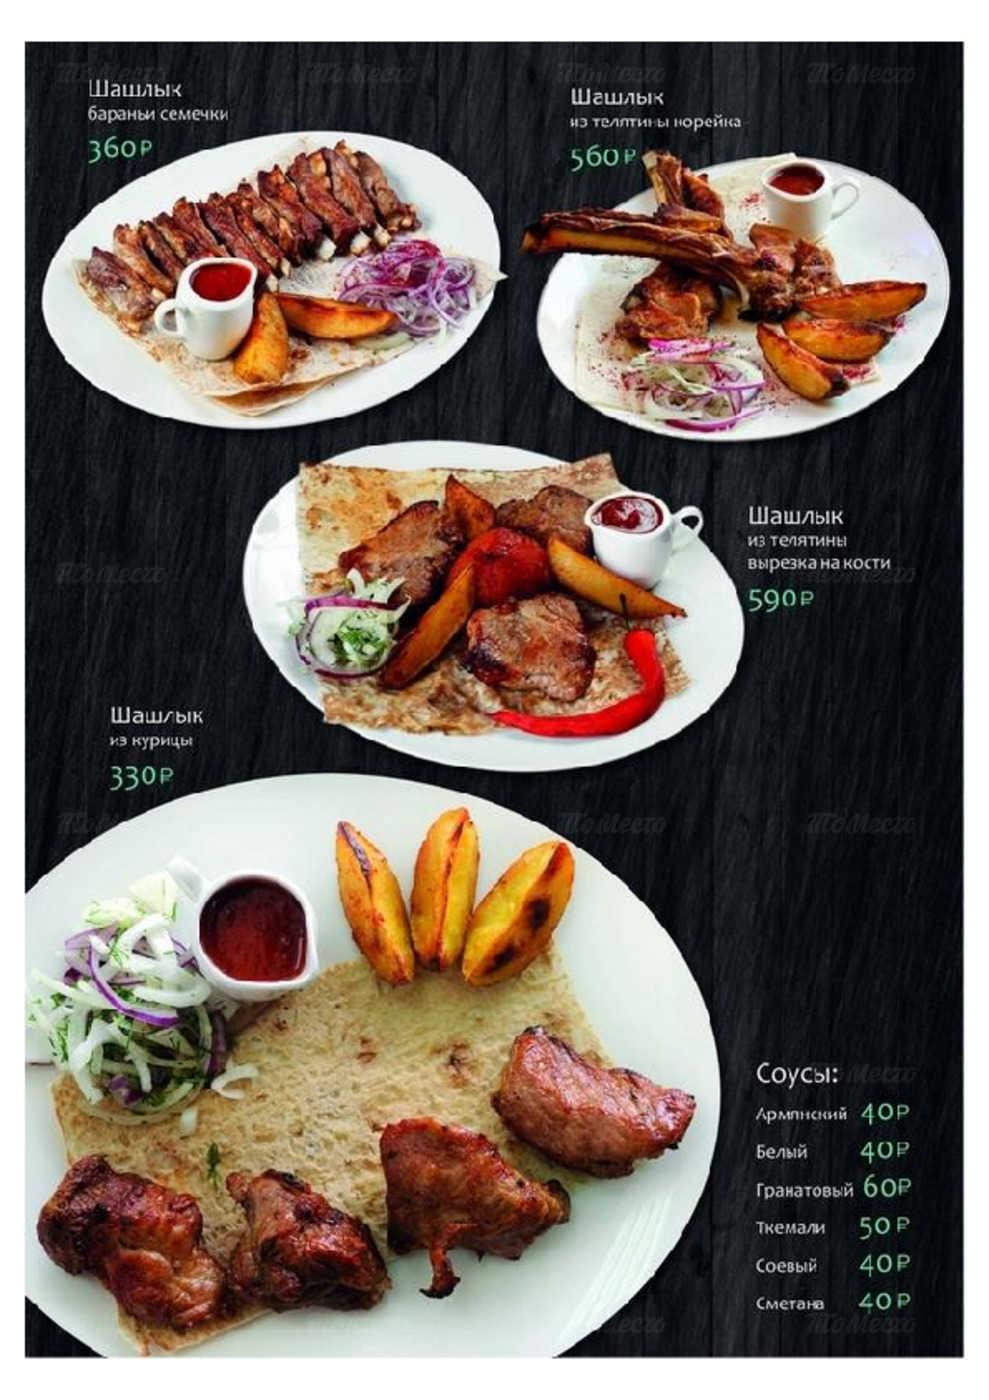 Меню ресторана Любимый Хабиб на проспекте Стачек фото 33